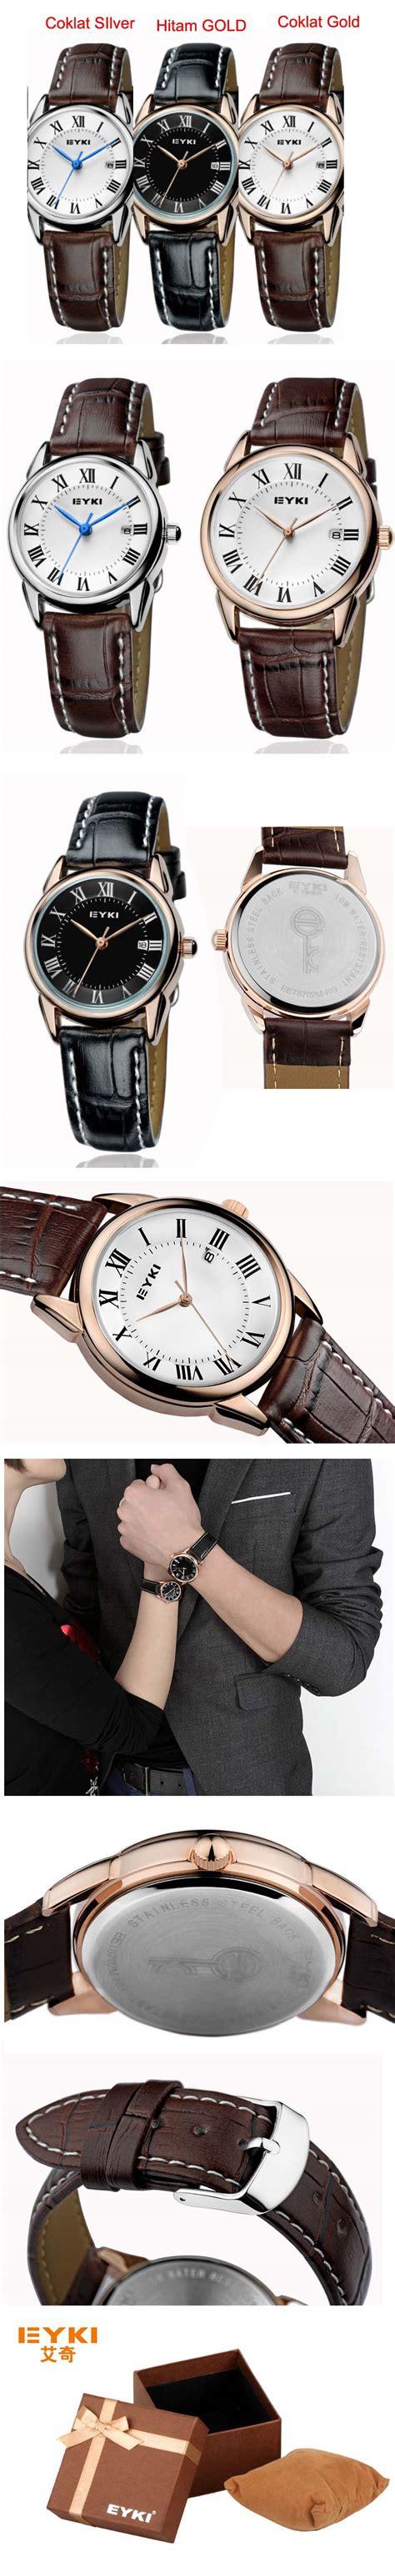 Pantofel Kulit Sepatu Pria Rbn 022 jam tangan eyki kulit